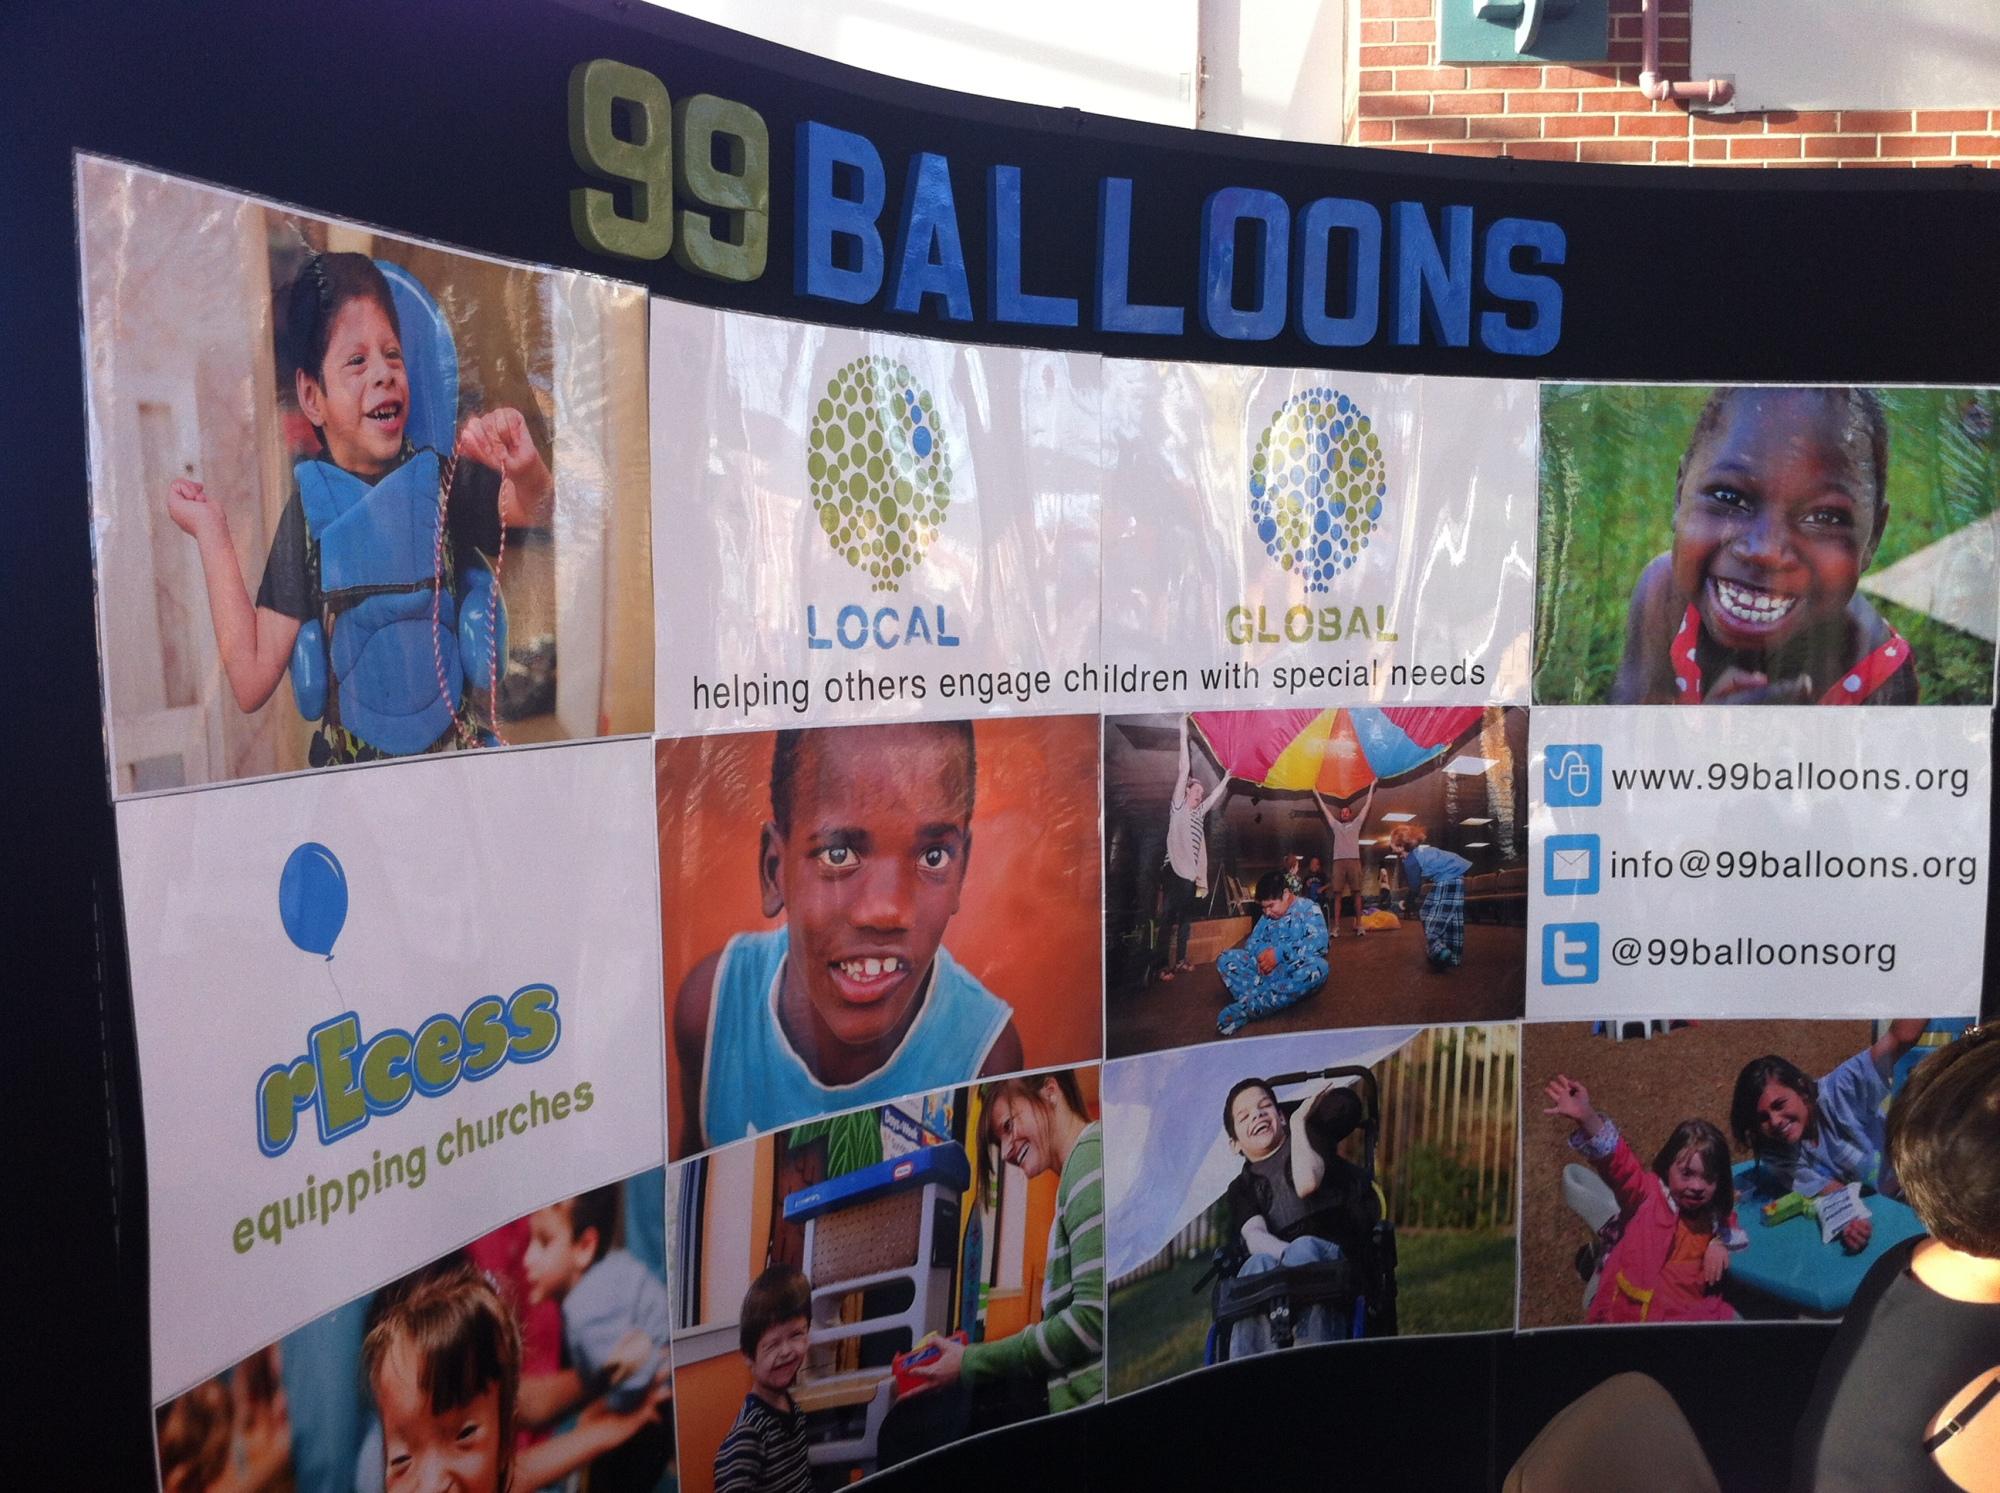 99 Balloons, Nonprofit